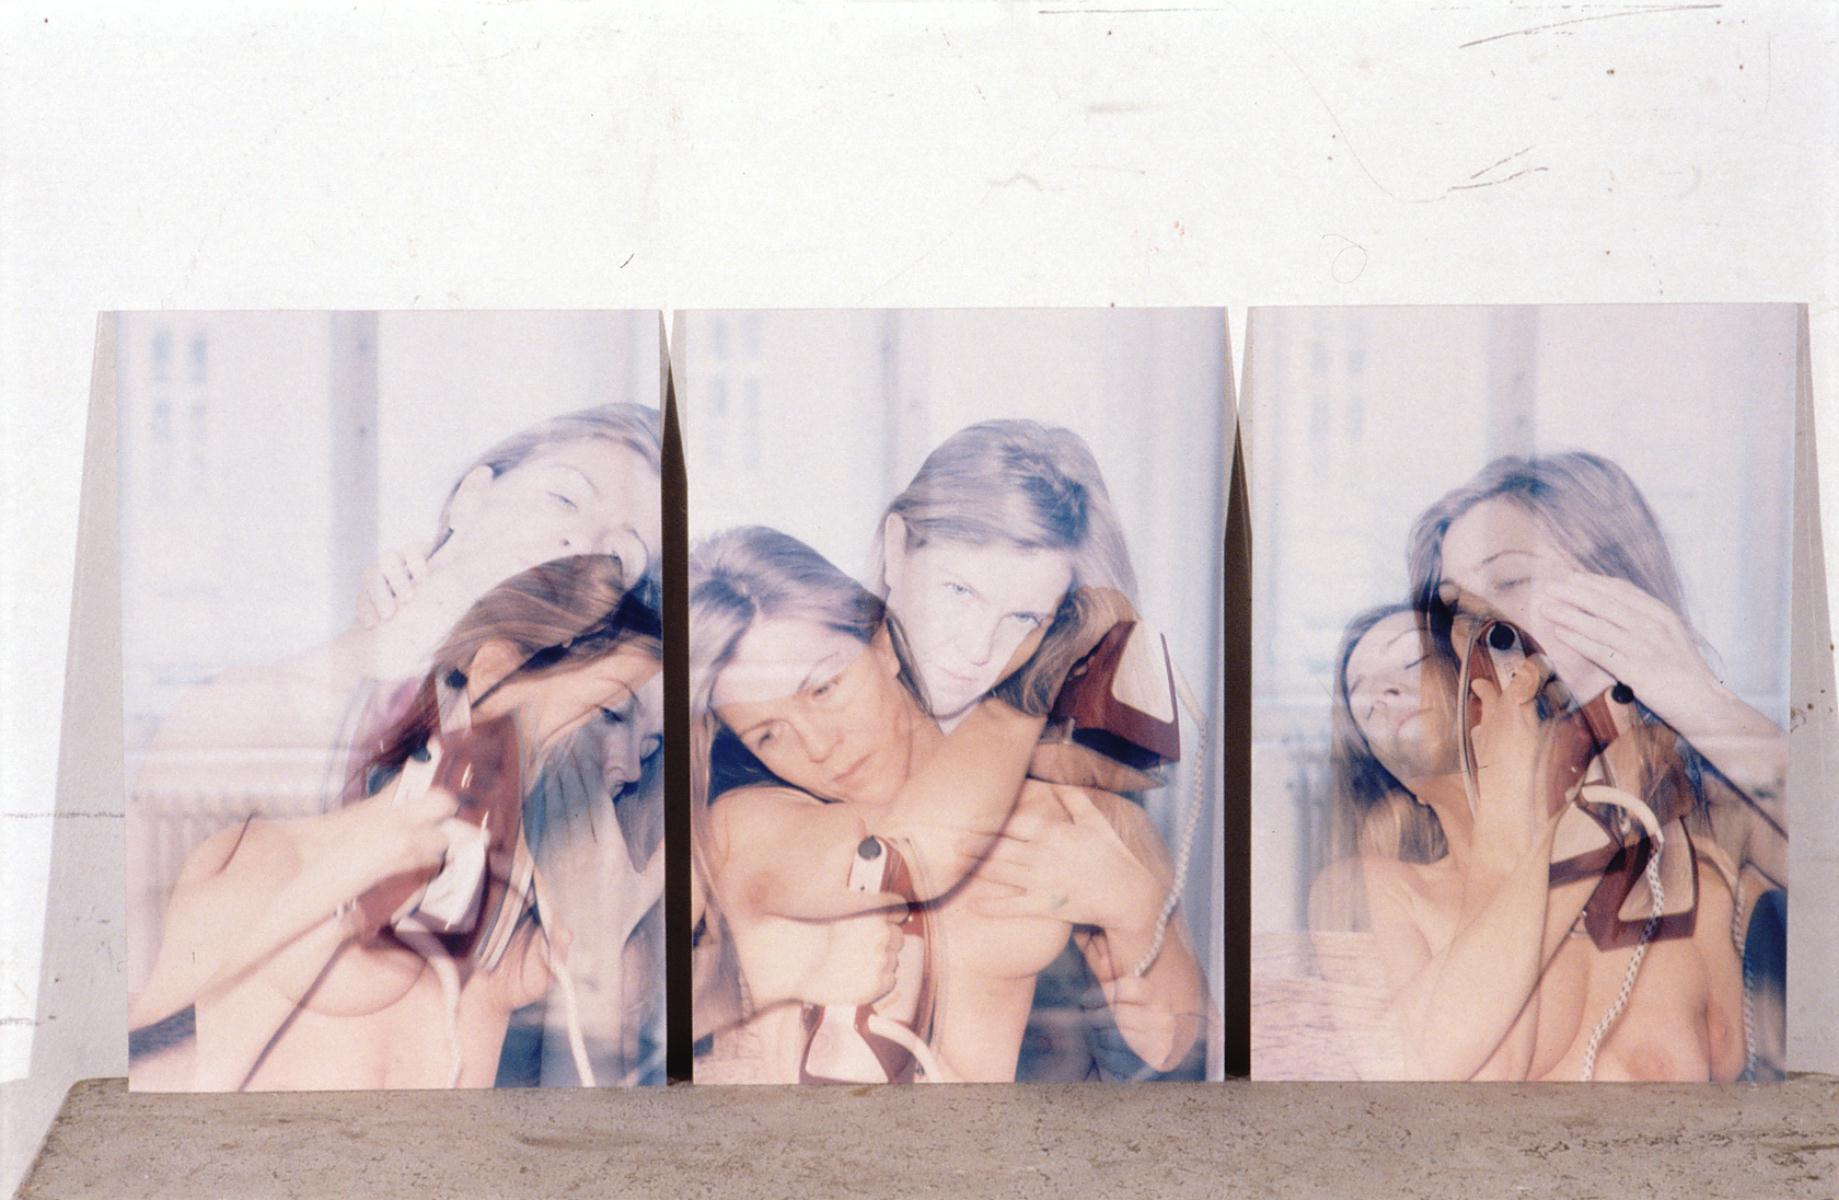 Abbildung Schumann,  Claudia Schumann,   OBERFLAECHEN DES SELBST ALS ERFAHRUNG , 2000, C-Prints on aluminum, analog multiple exposure, 3 pieces at 11.8 x 7.9 inches (30 x 20 cm) each. Courtesy of the artist and Galerie Jünger